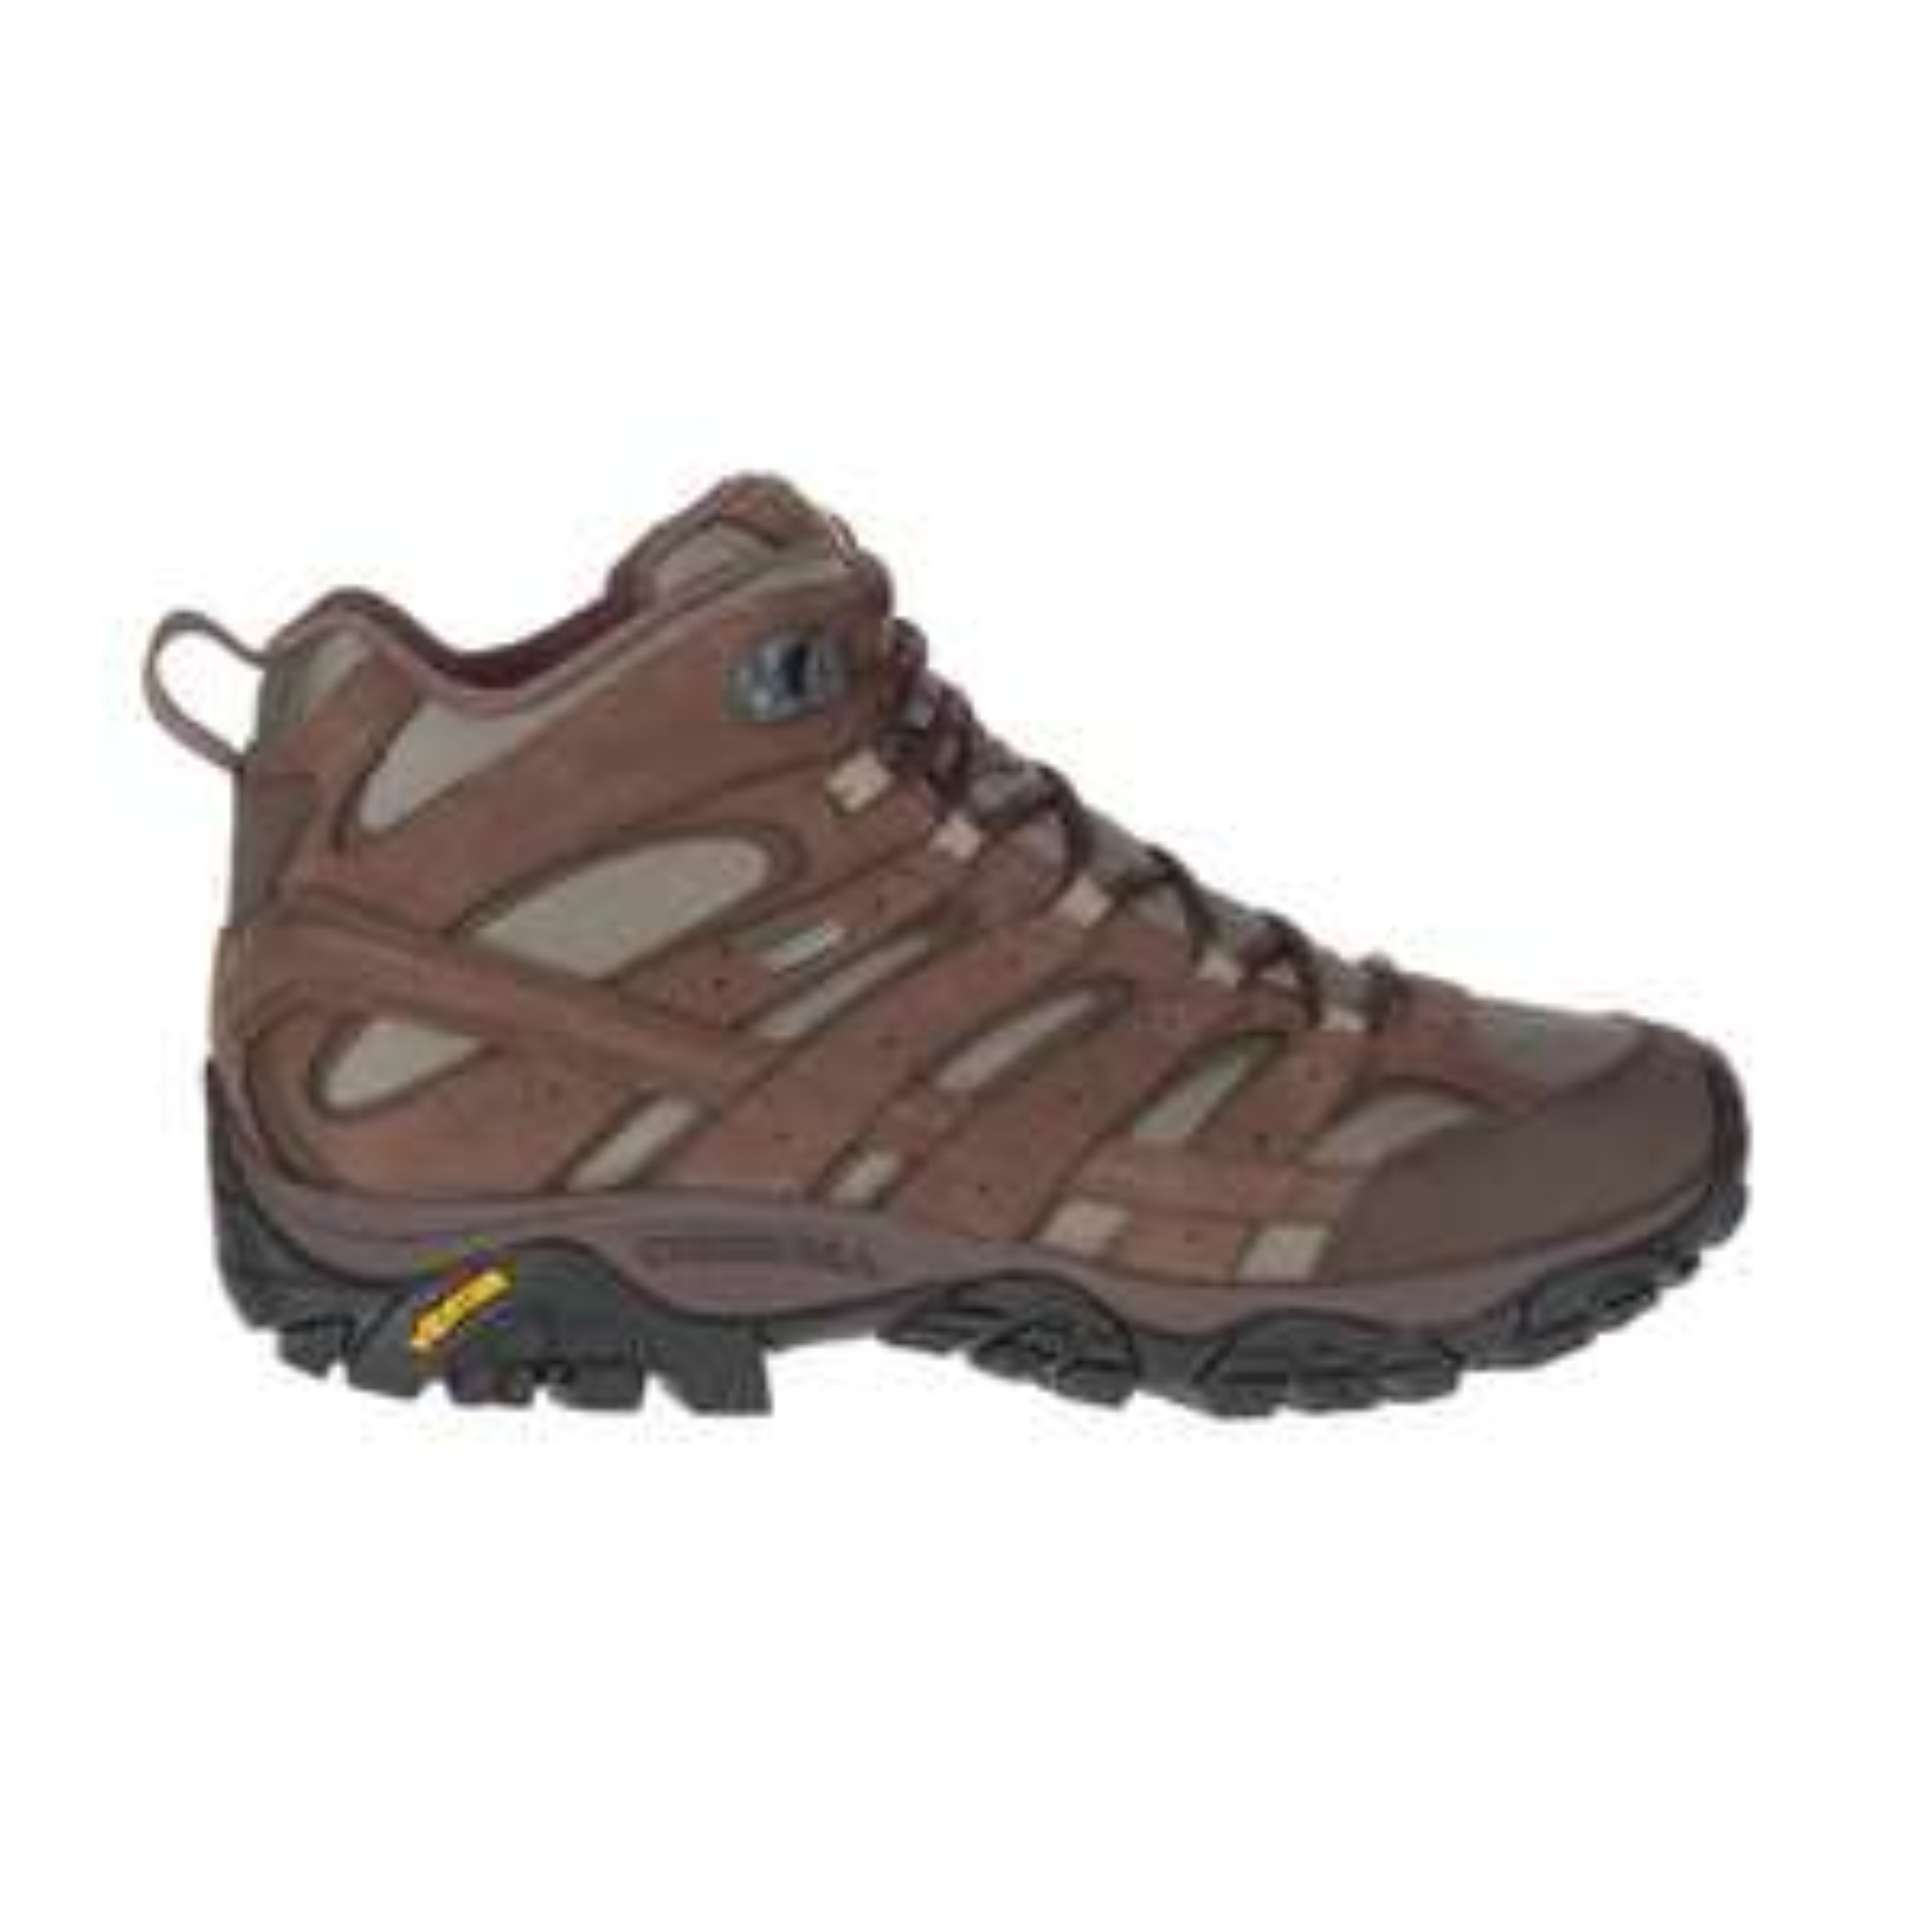 MERRELLMOAB 2 SMOOTH MID GORE-TEX WALKING BOOTS - £62.49 @ SportsShoes.com (+£4.99 P&P)